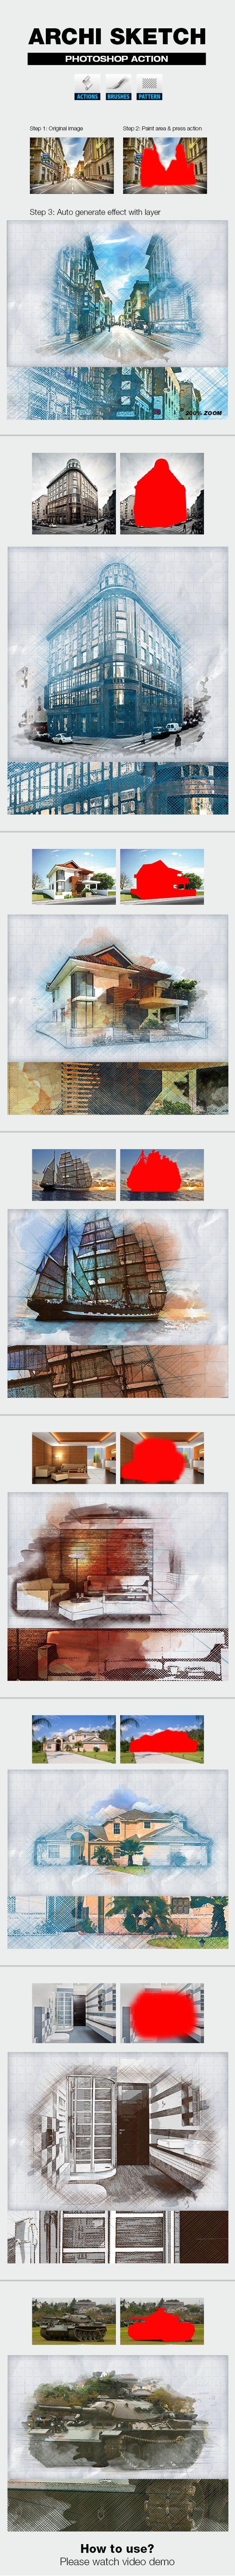 Archi Sketch #photoshop #atn #image • Download ➝ https://graphicriver.net/item/archi-sketch/18712177?ref=pxcr